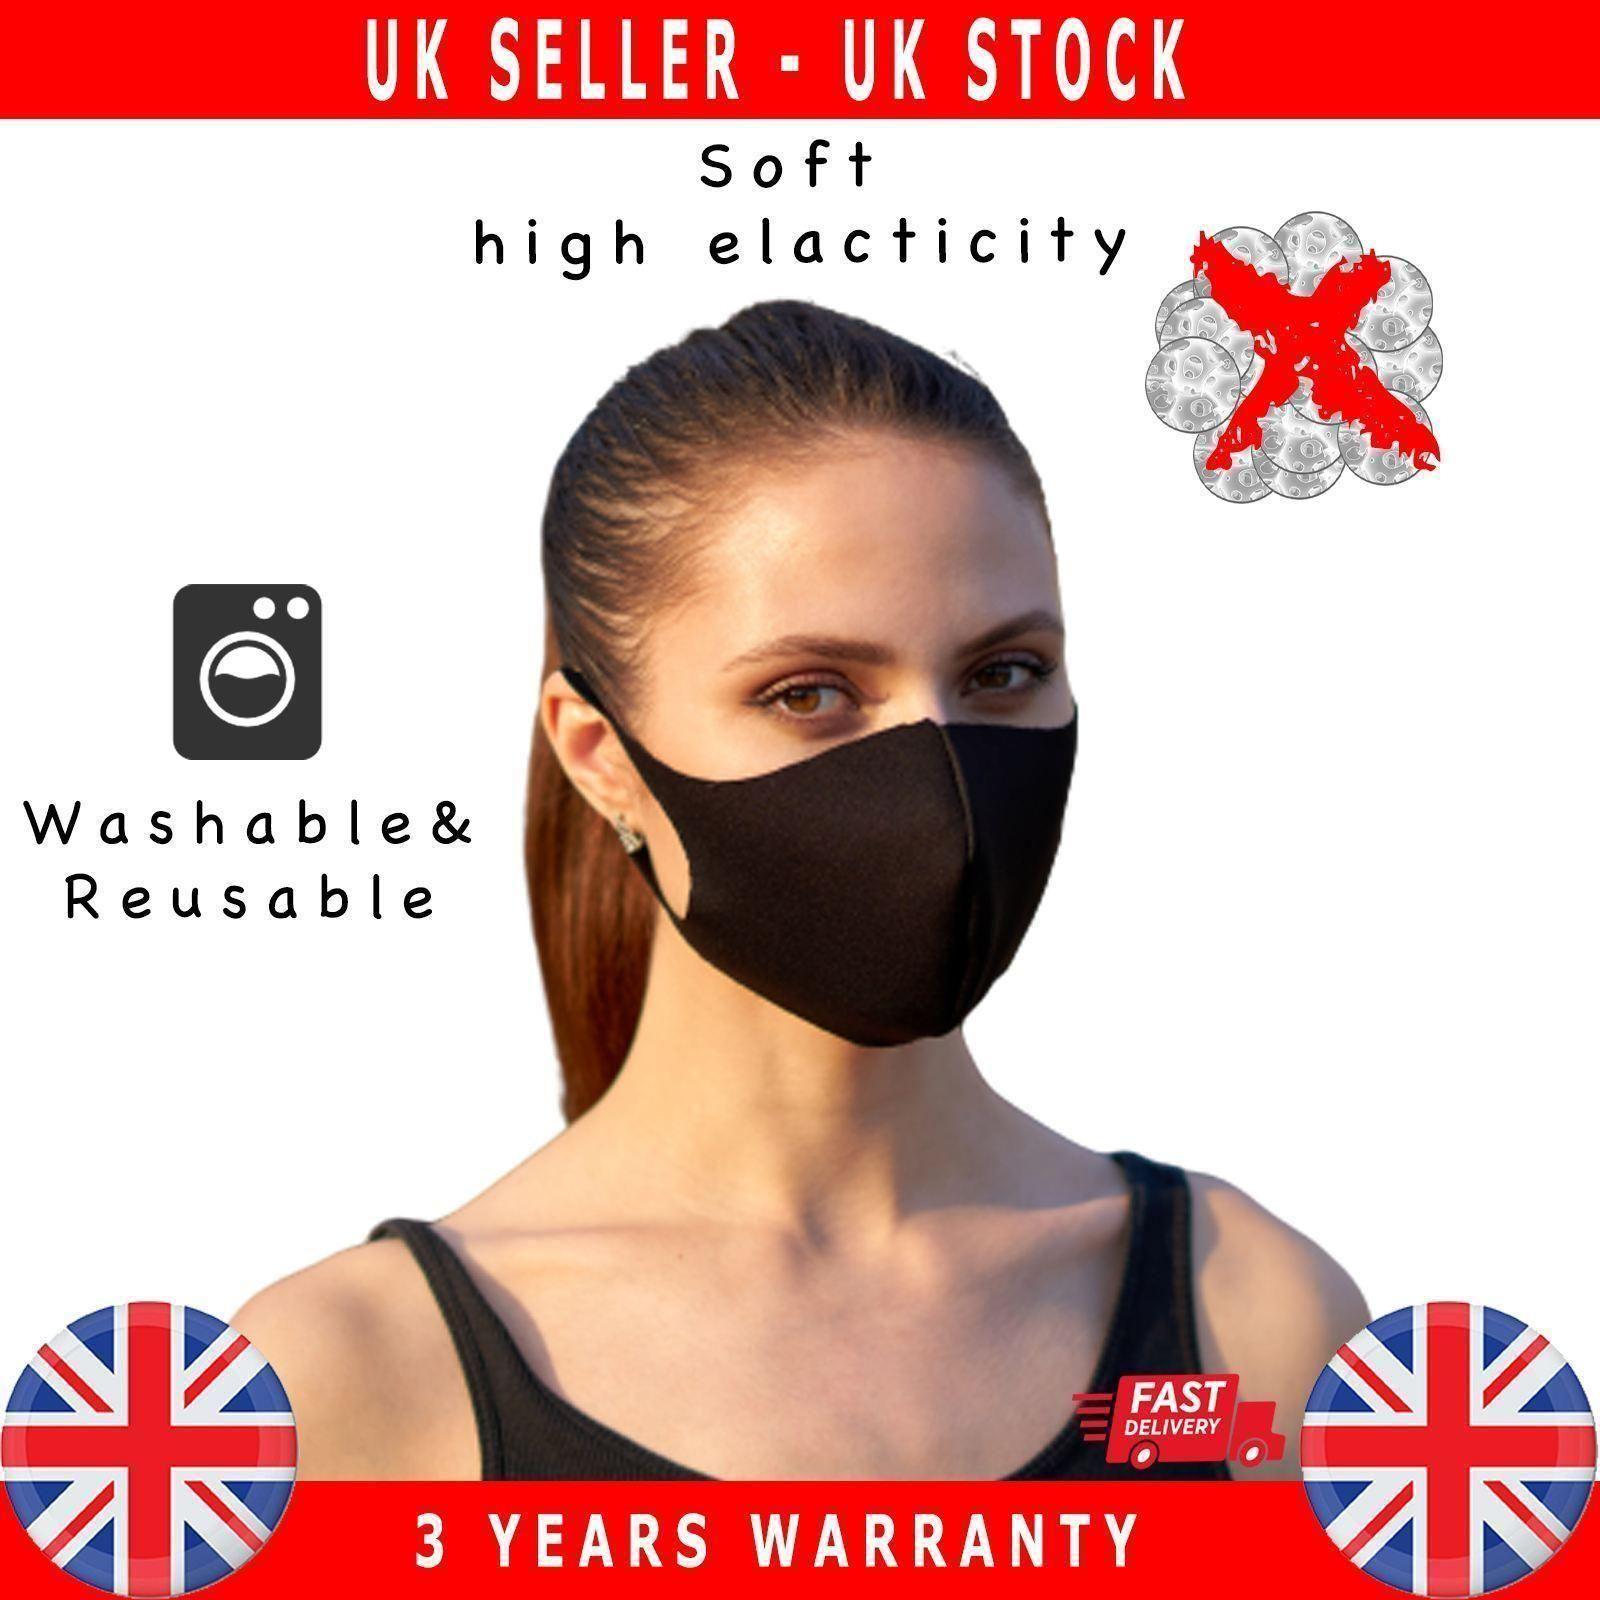 Reusable-Face-Mask-Mouth-Nose-Breathable-Washable-Antibacteriel thumbnail 2